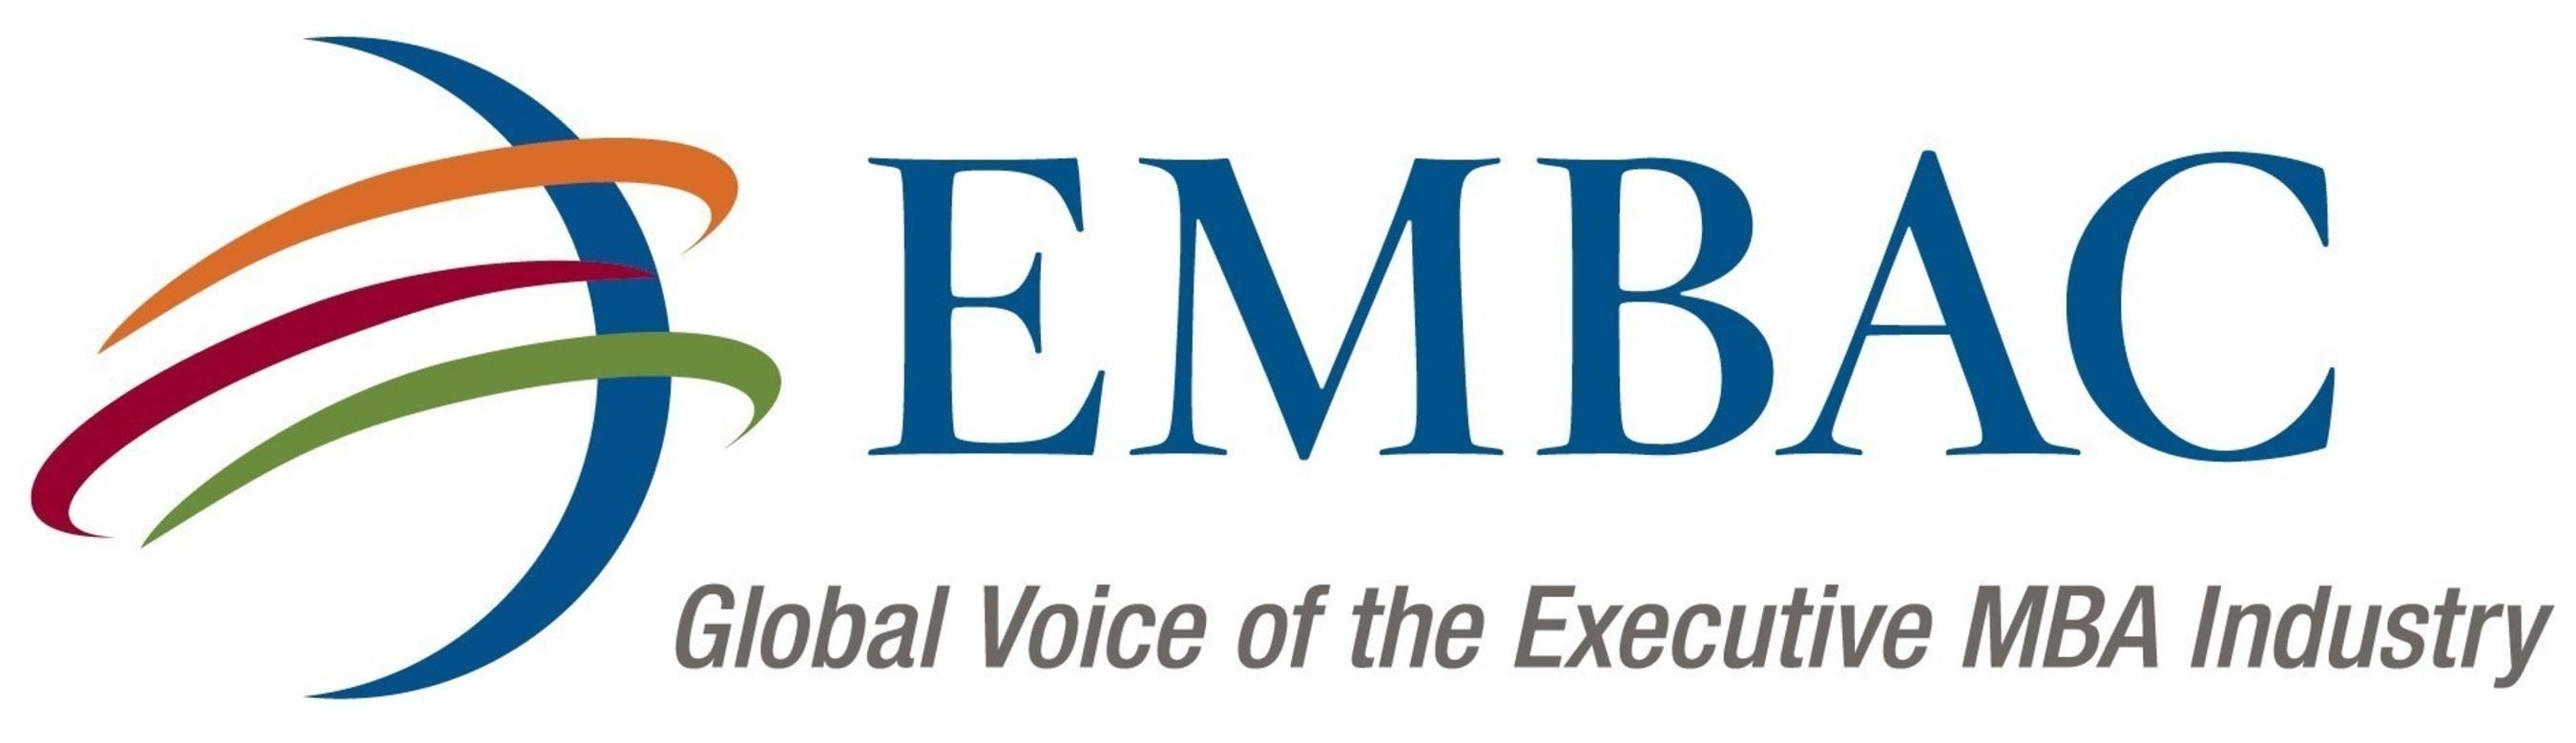 (PRNewsFoto/Executive MBA Council)